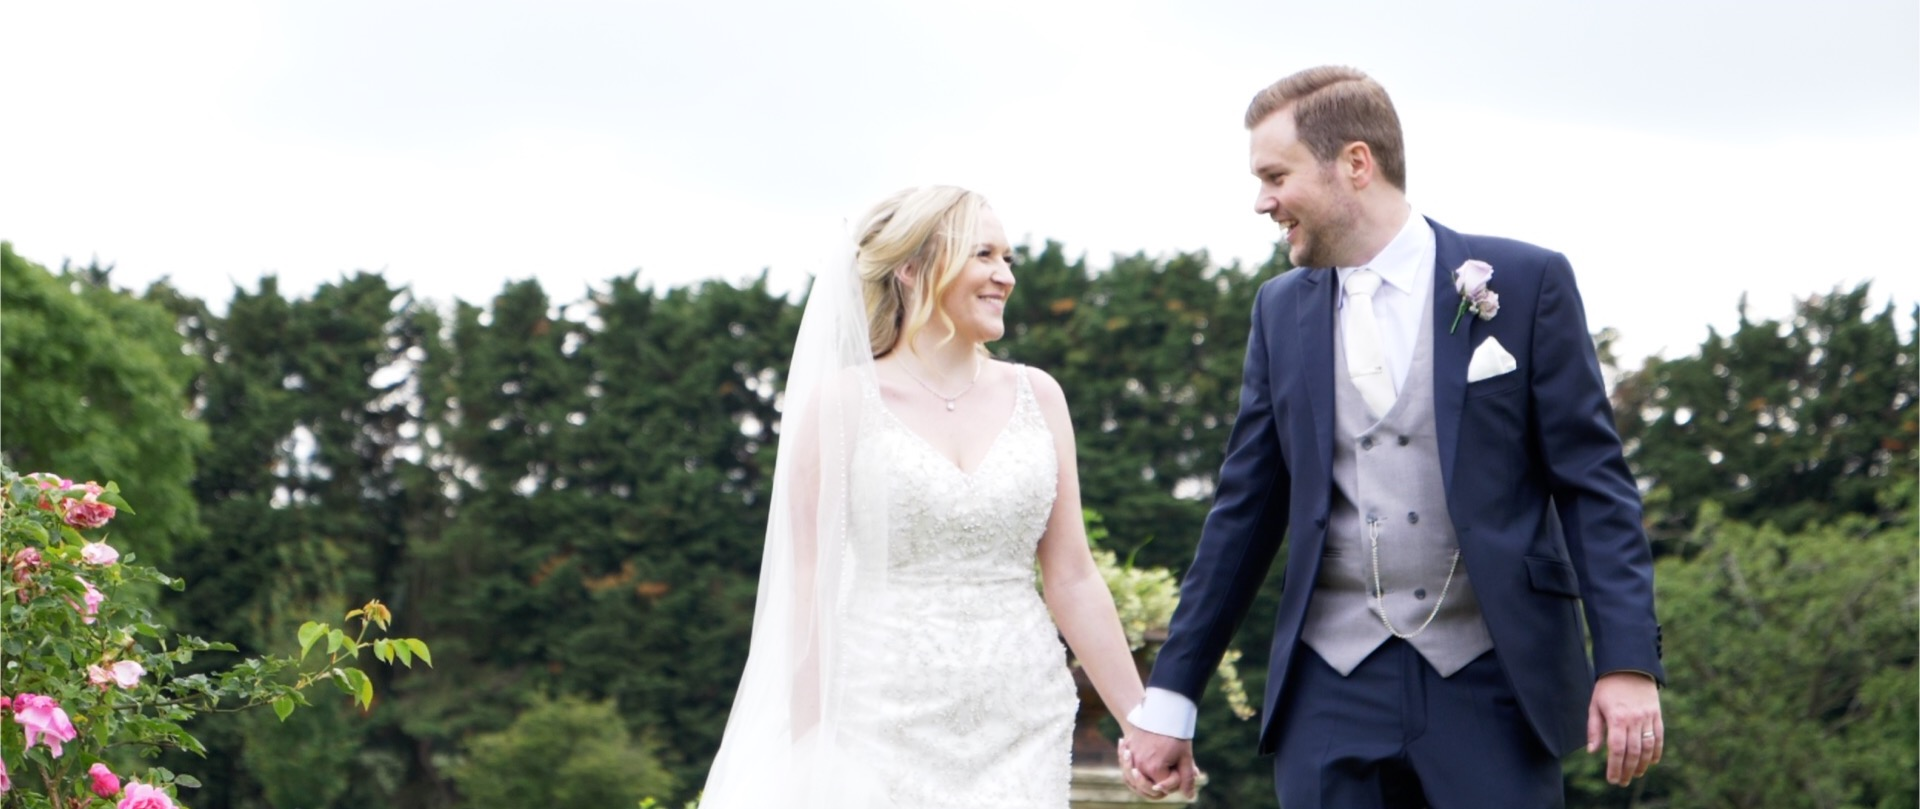 Dan and Laur wedding video Quendon Hall.jpg